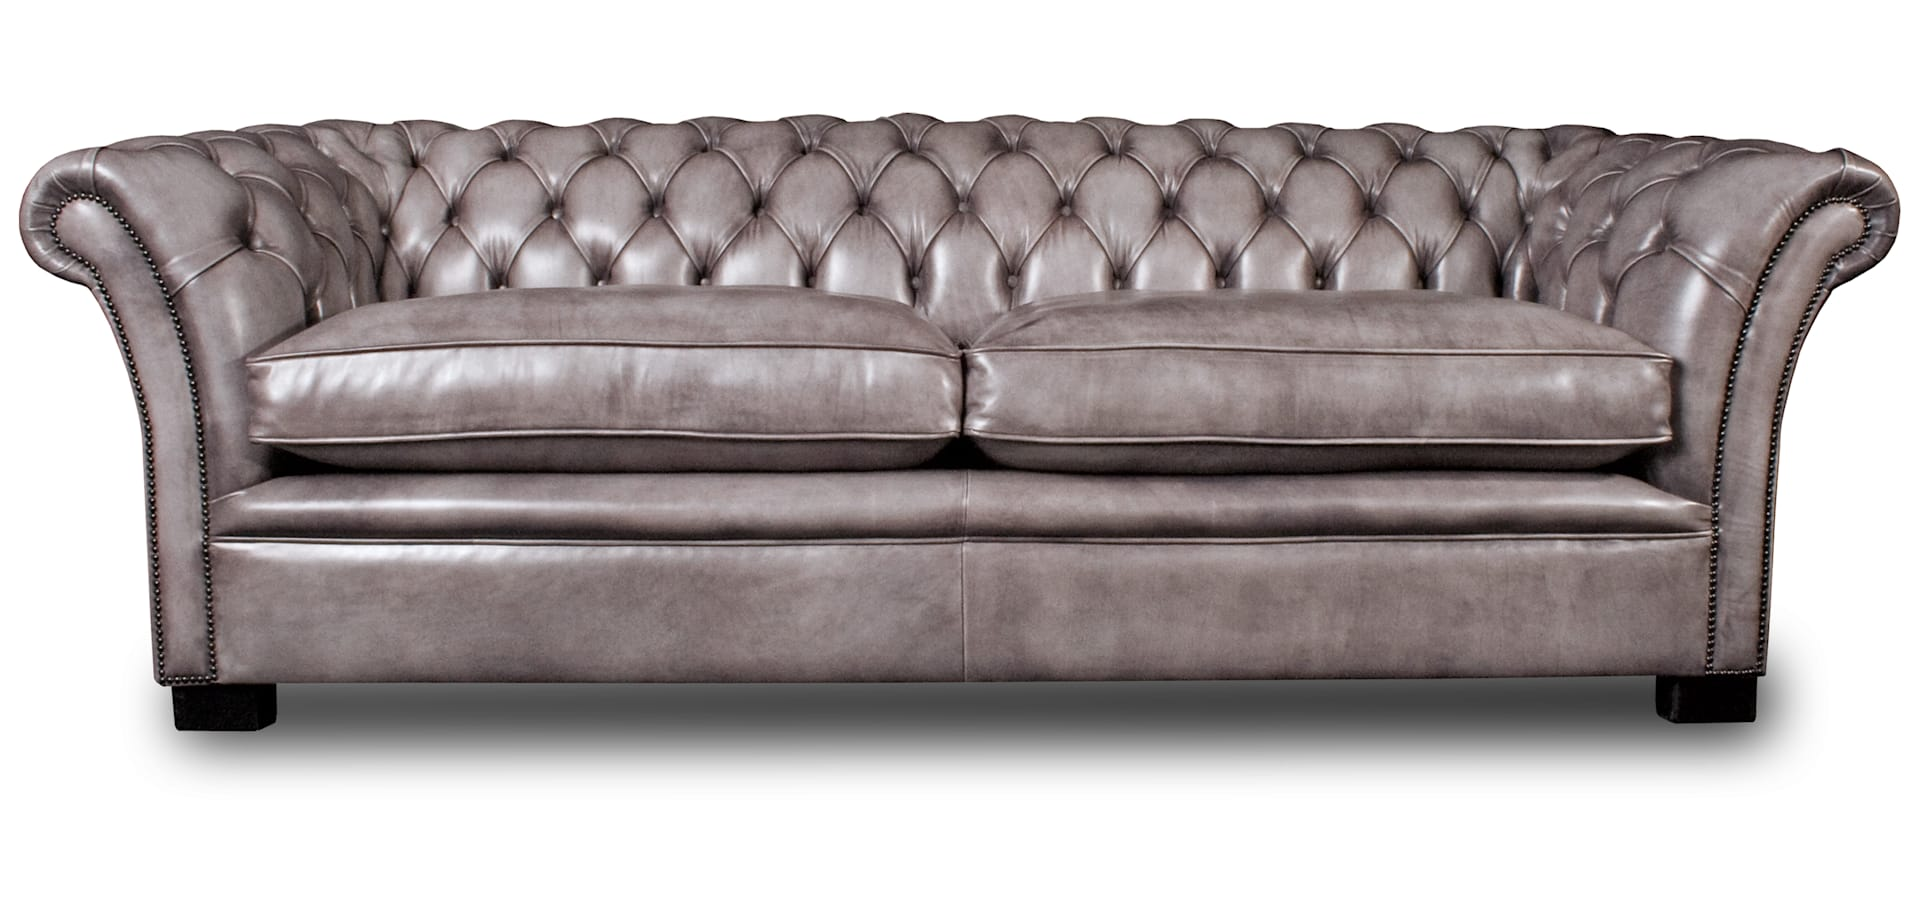 british furniture collection m bel accessoires in bochum homify. Black Bedroom Furniture Sets. Home Design Ideas